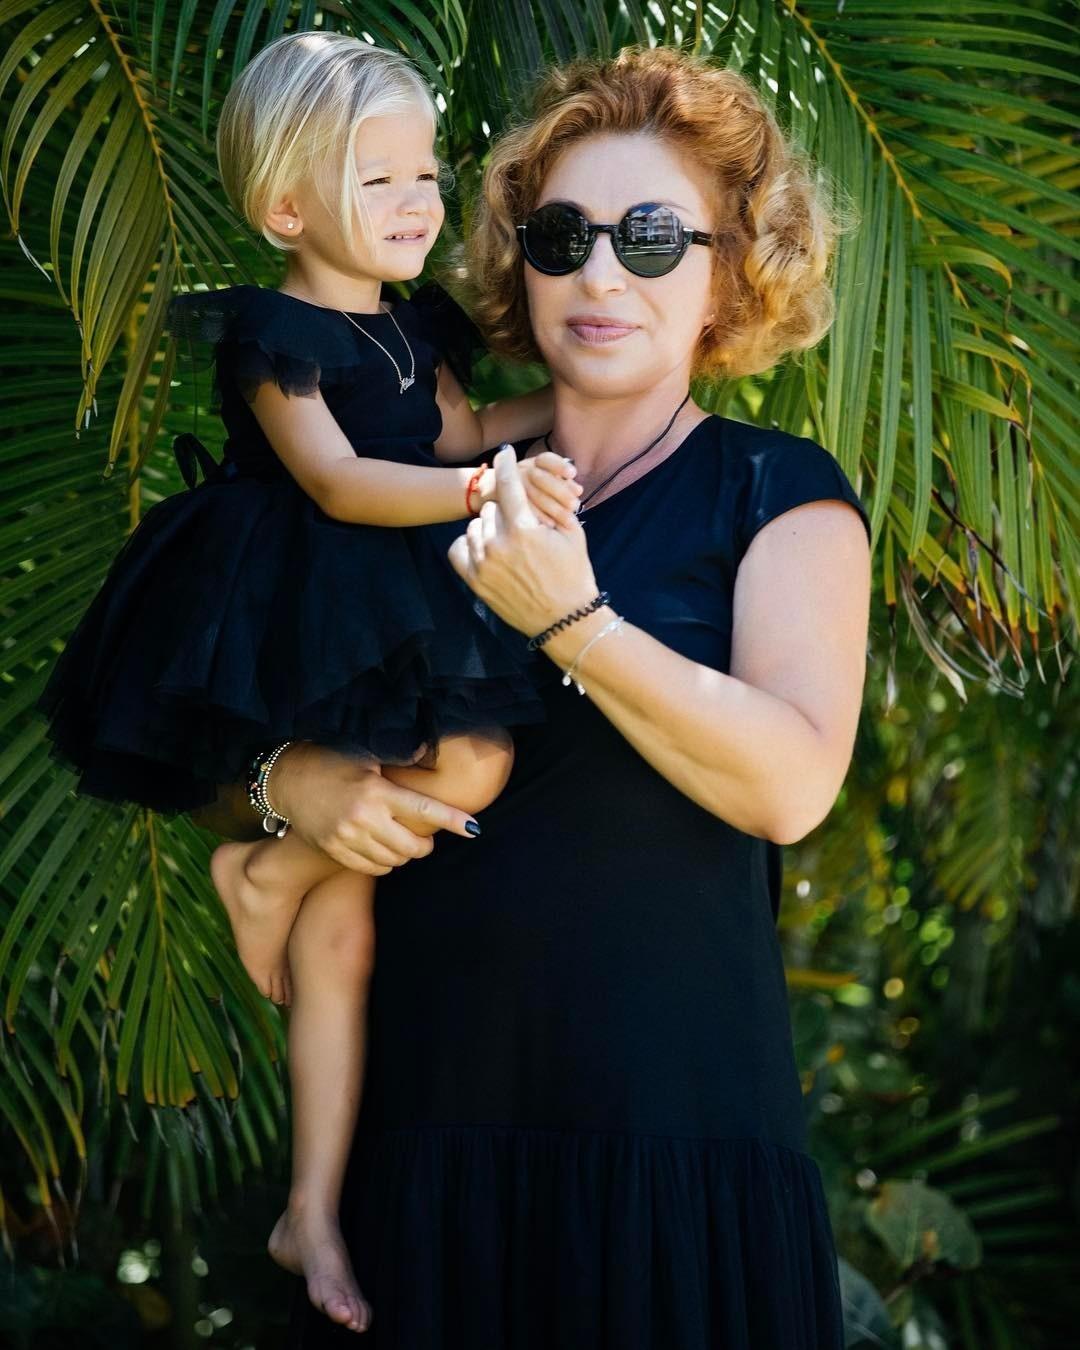 «Неделю лежала на диване и плакала»: мама Тимати рассказала, как пережила развод